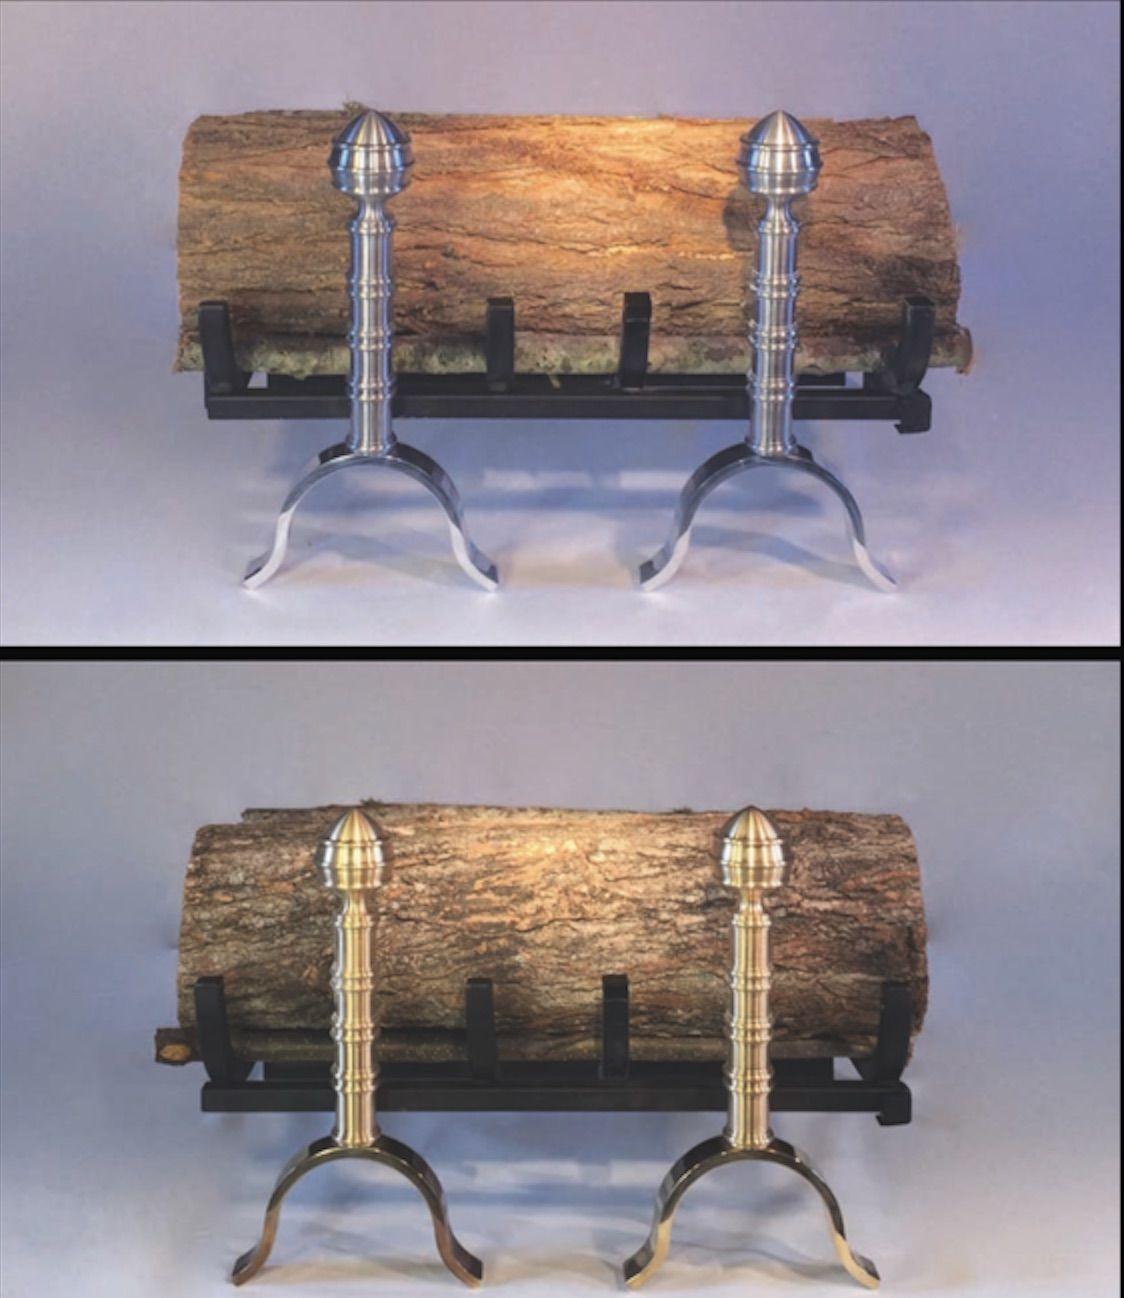 colis e chemin e sans conduit d 39 vacuation dore inox. Black Bedroom Furniture Sets. Home Design Ideas